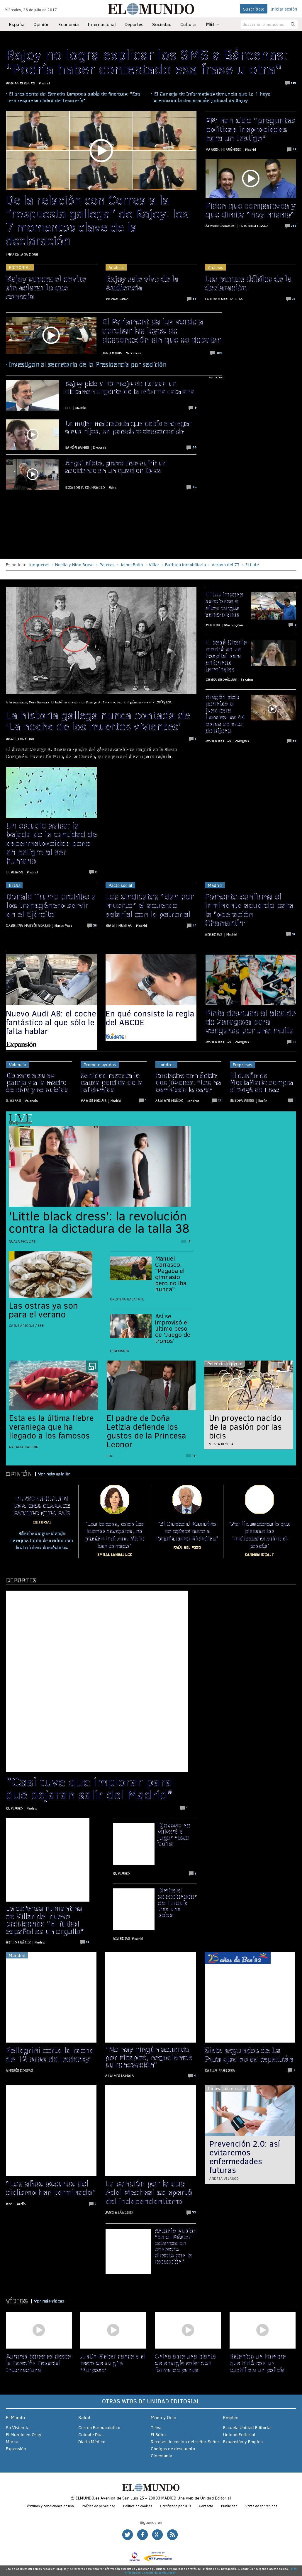 El Mundo at Wednesday July 26, 2017, 7:16 p.m. UTC